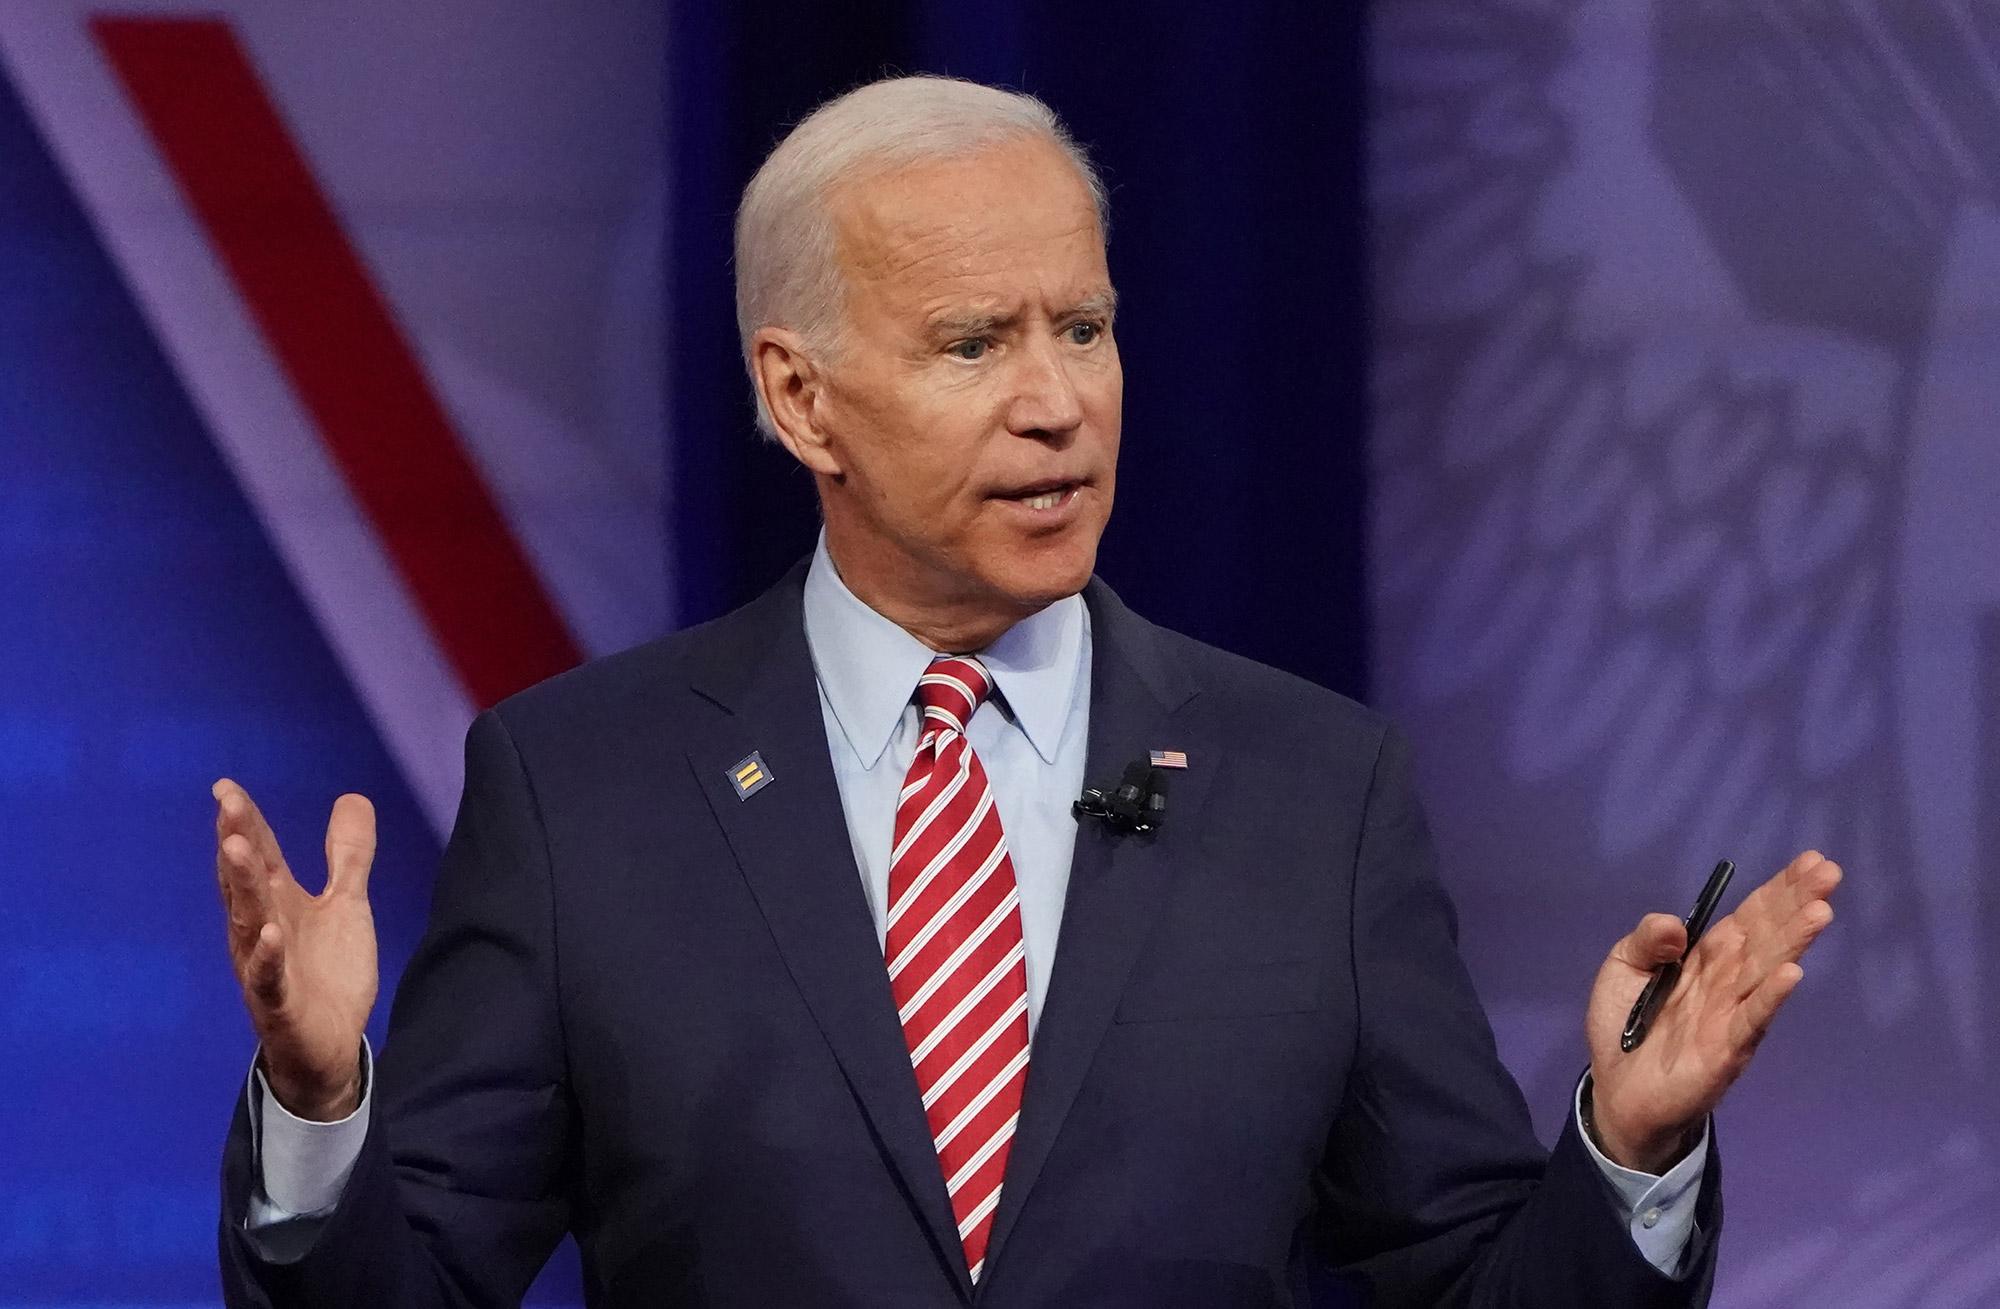 Ohio Democratic Debate Biden Warns Rivals Against Family Attacks Bloomberg